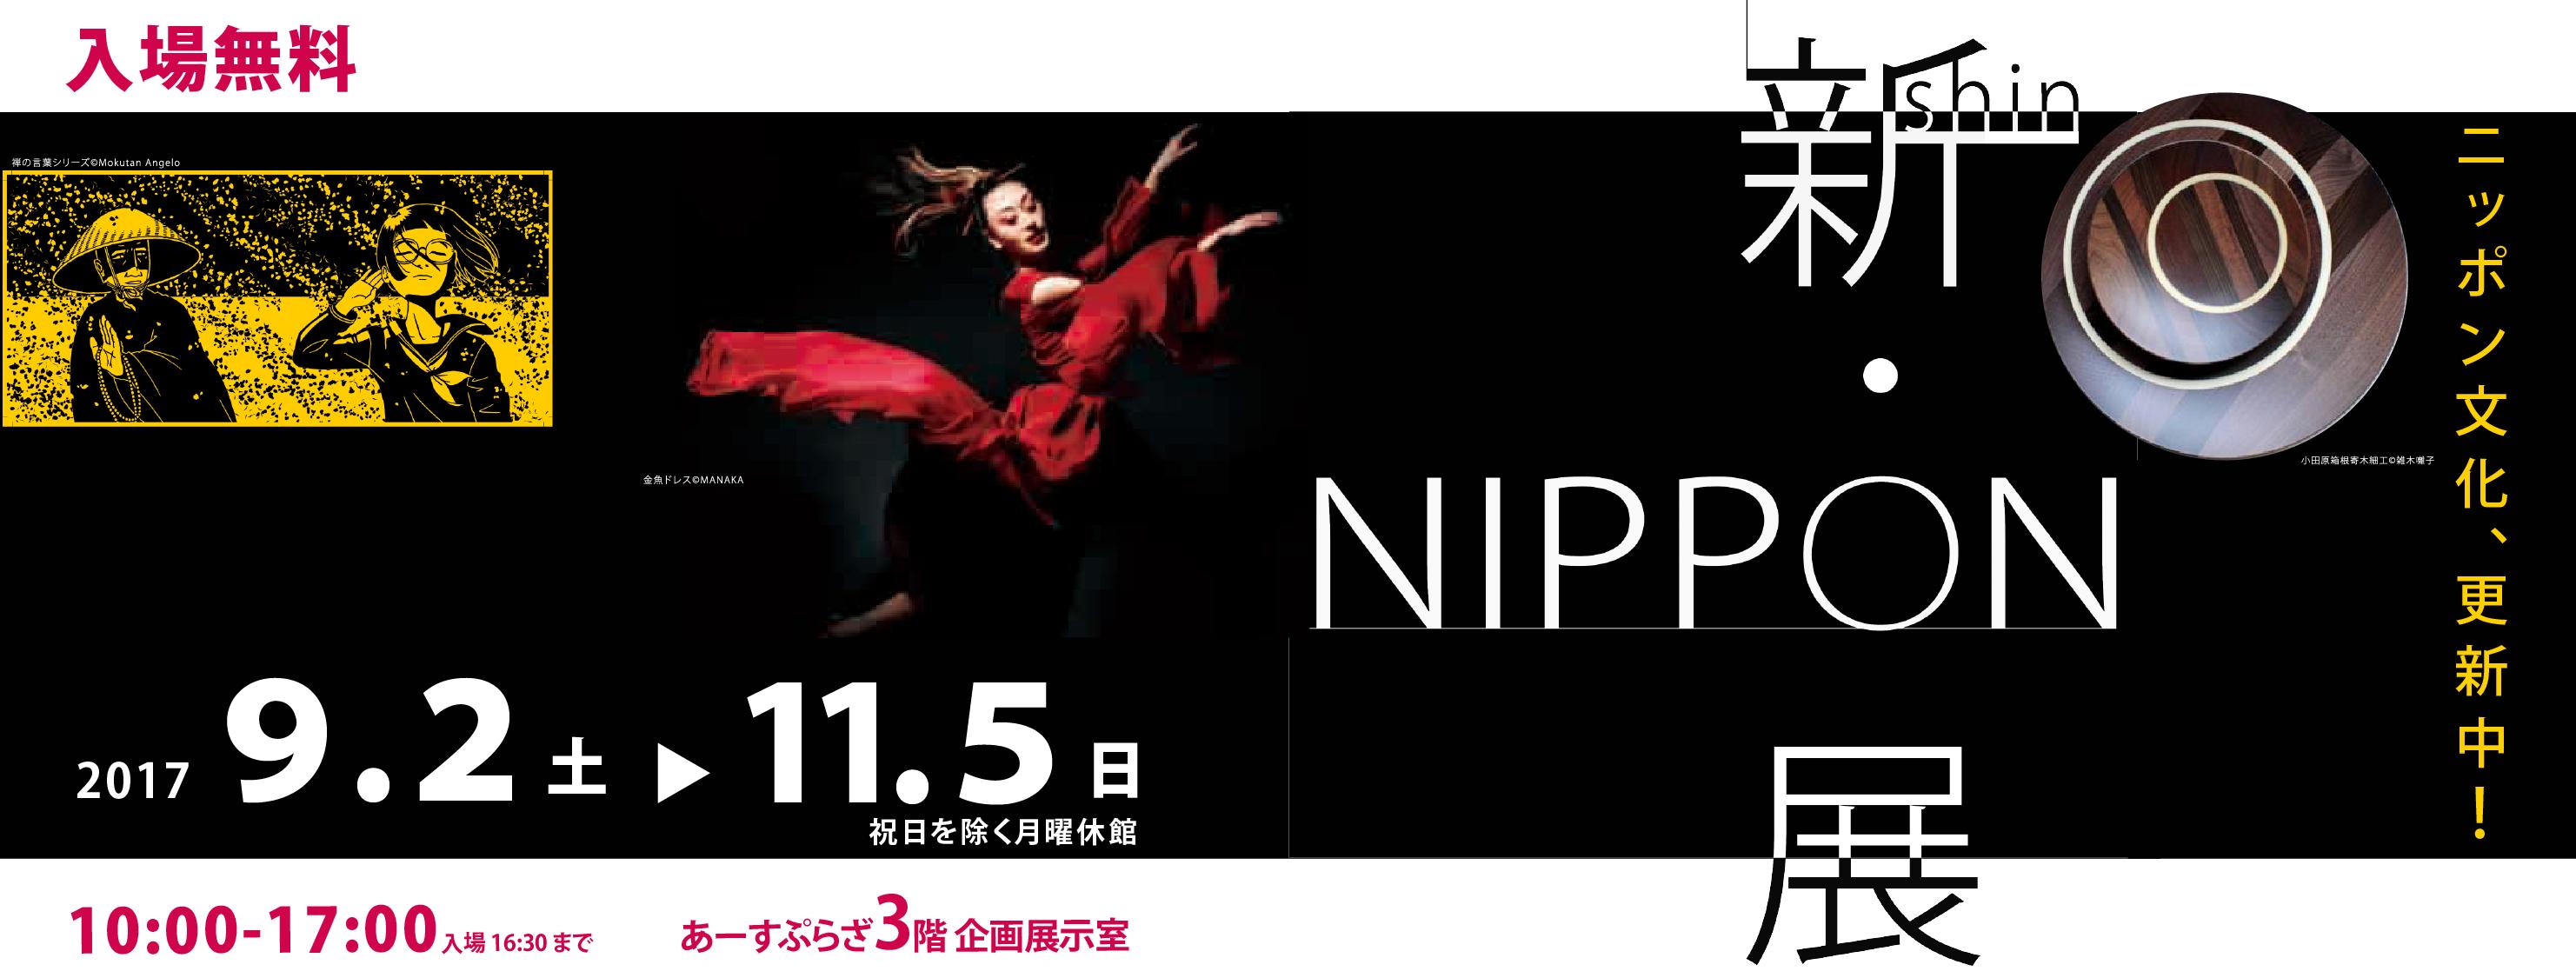 新NIPPON展